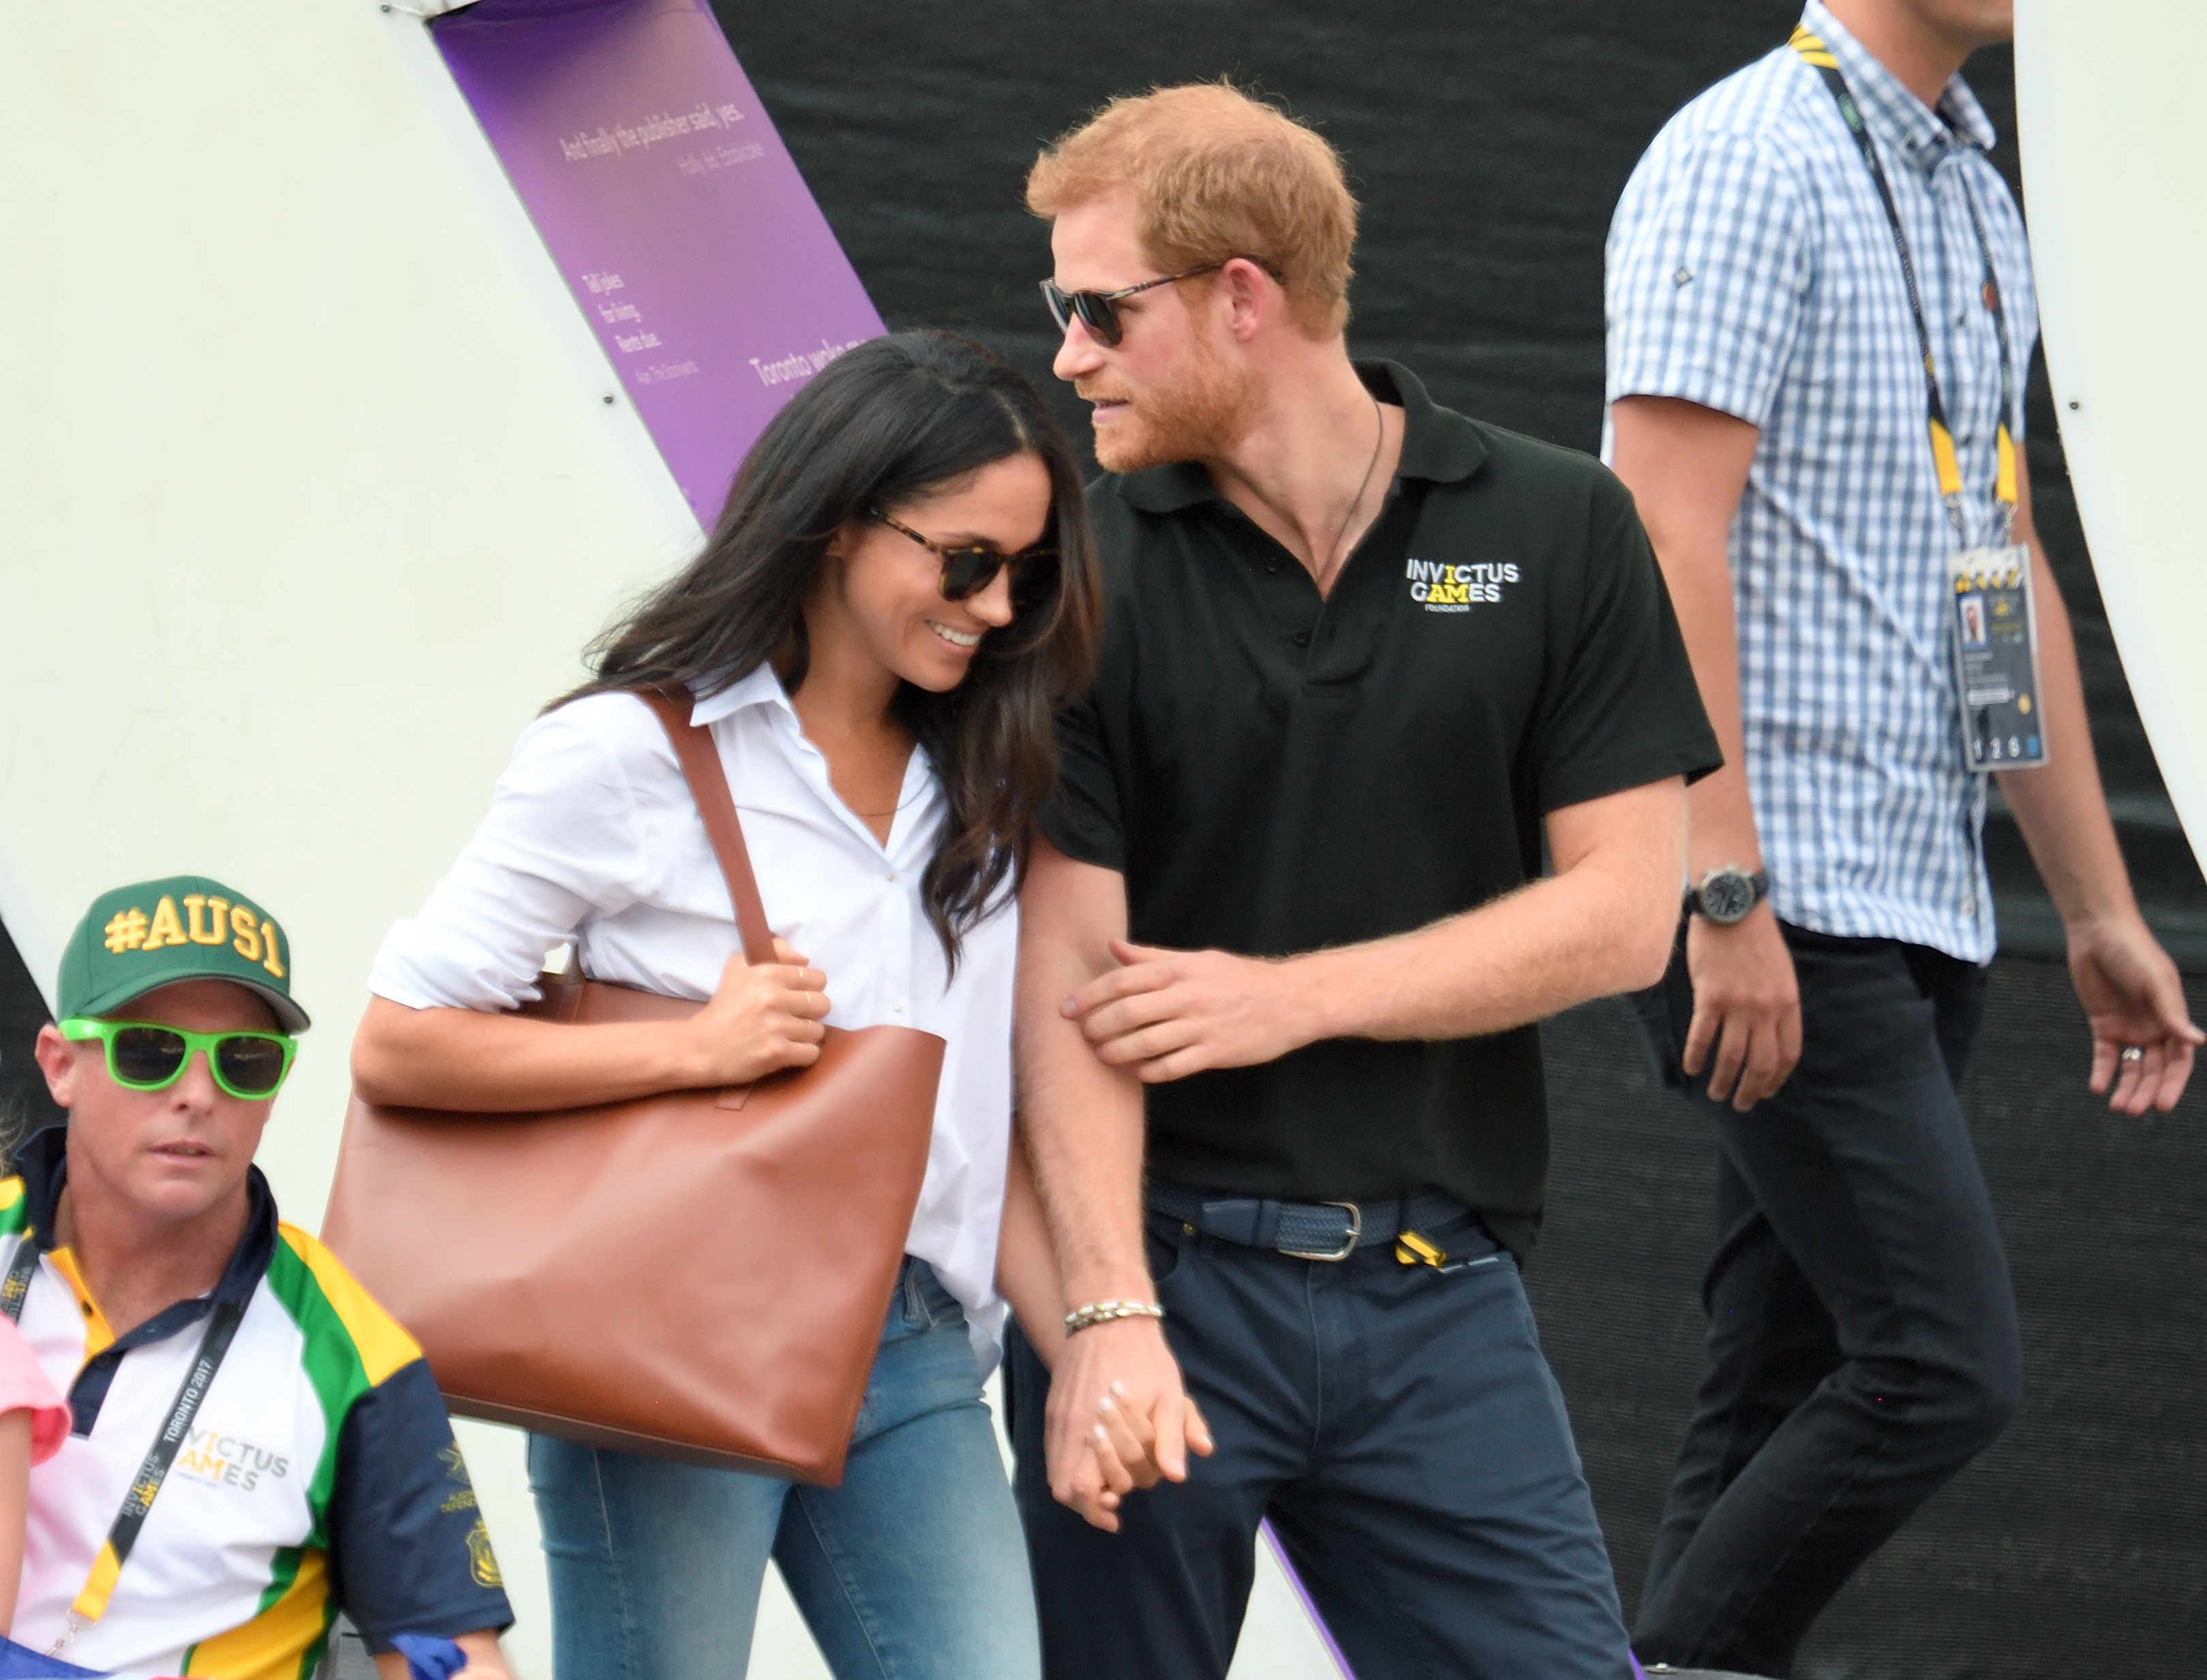 Timeline-Prince-Harry-Meghan-Markles-Romance-To-Royal-Wedding